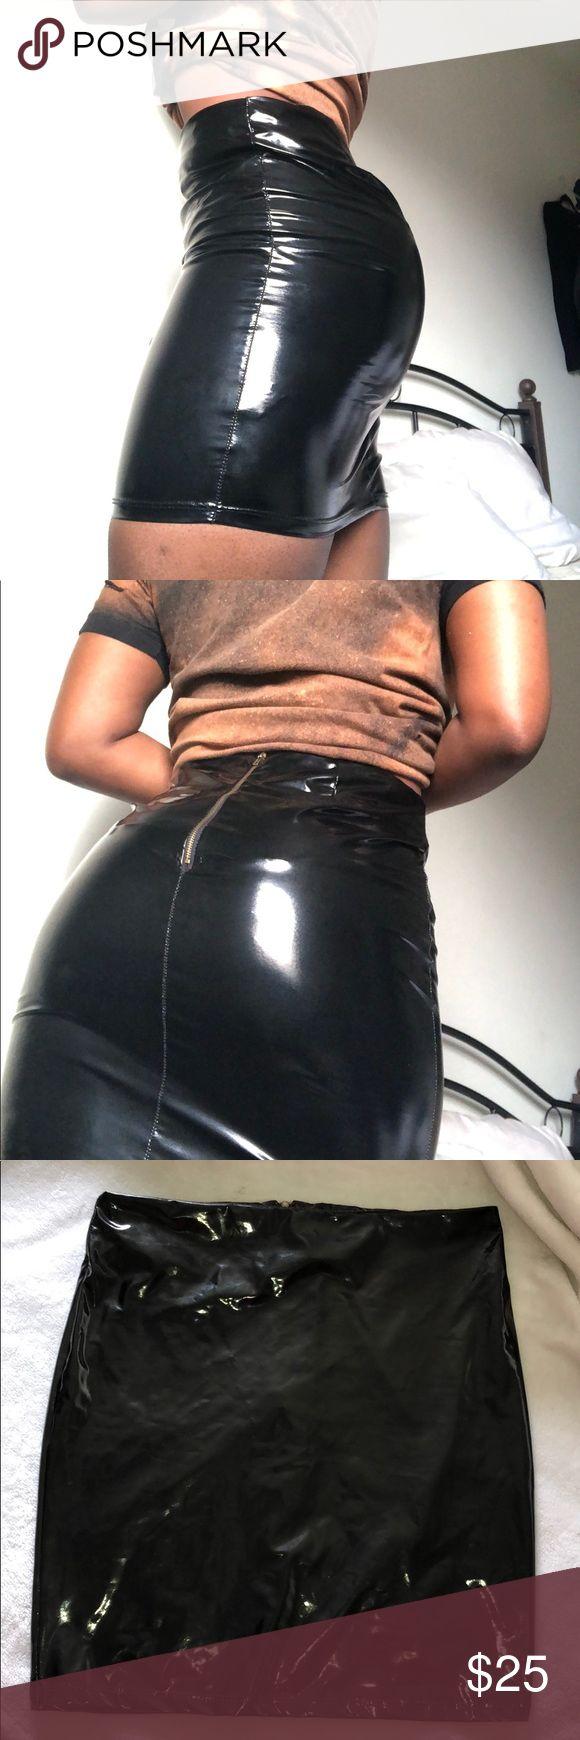 Black vinyl skirt Black vinyl skirt| worn once sorella boutique Skirts Mini